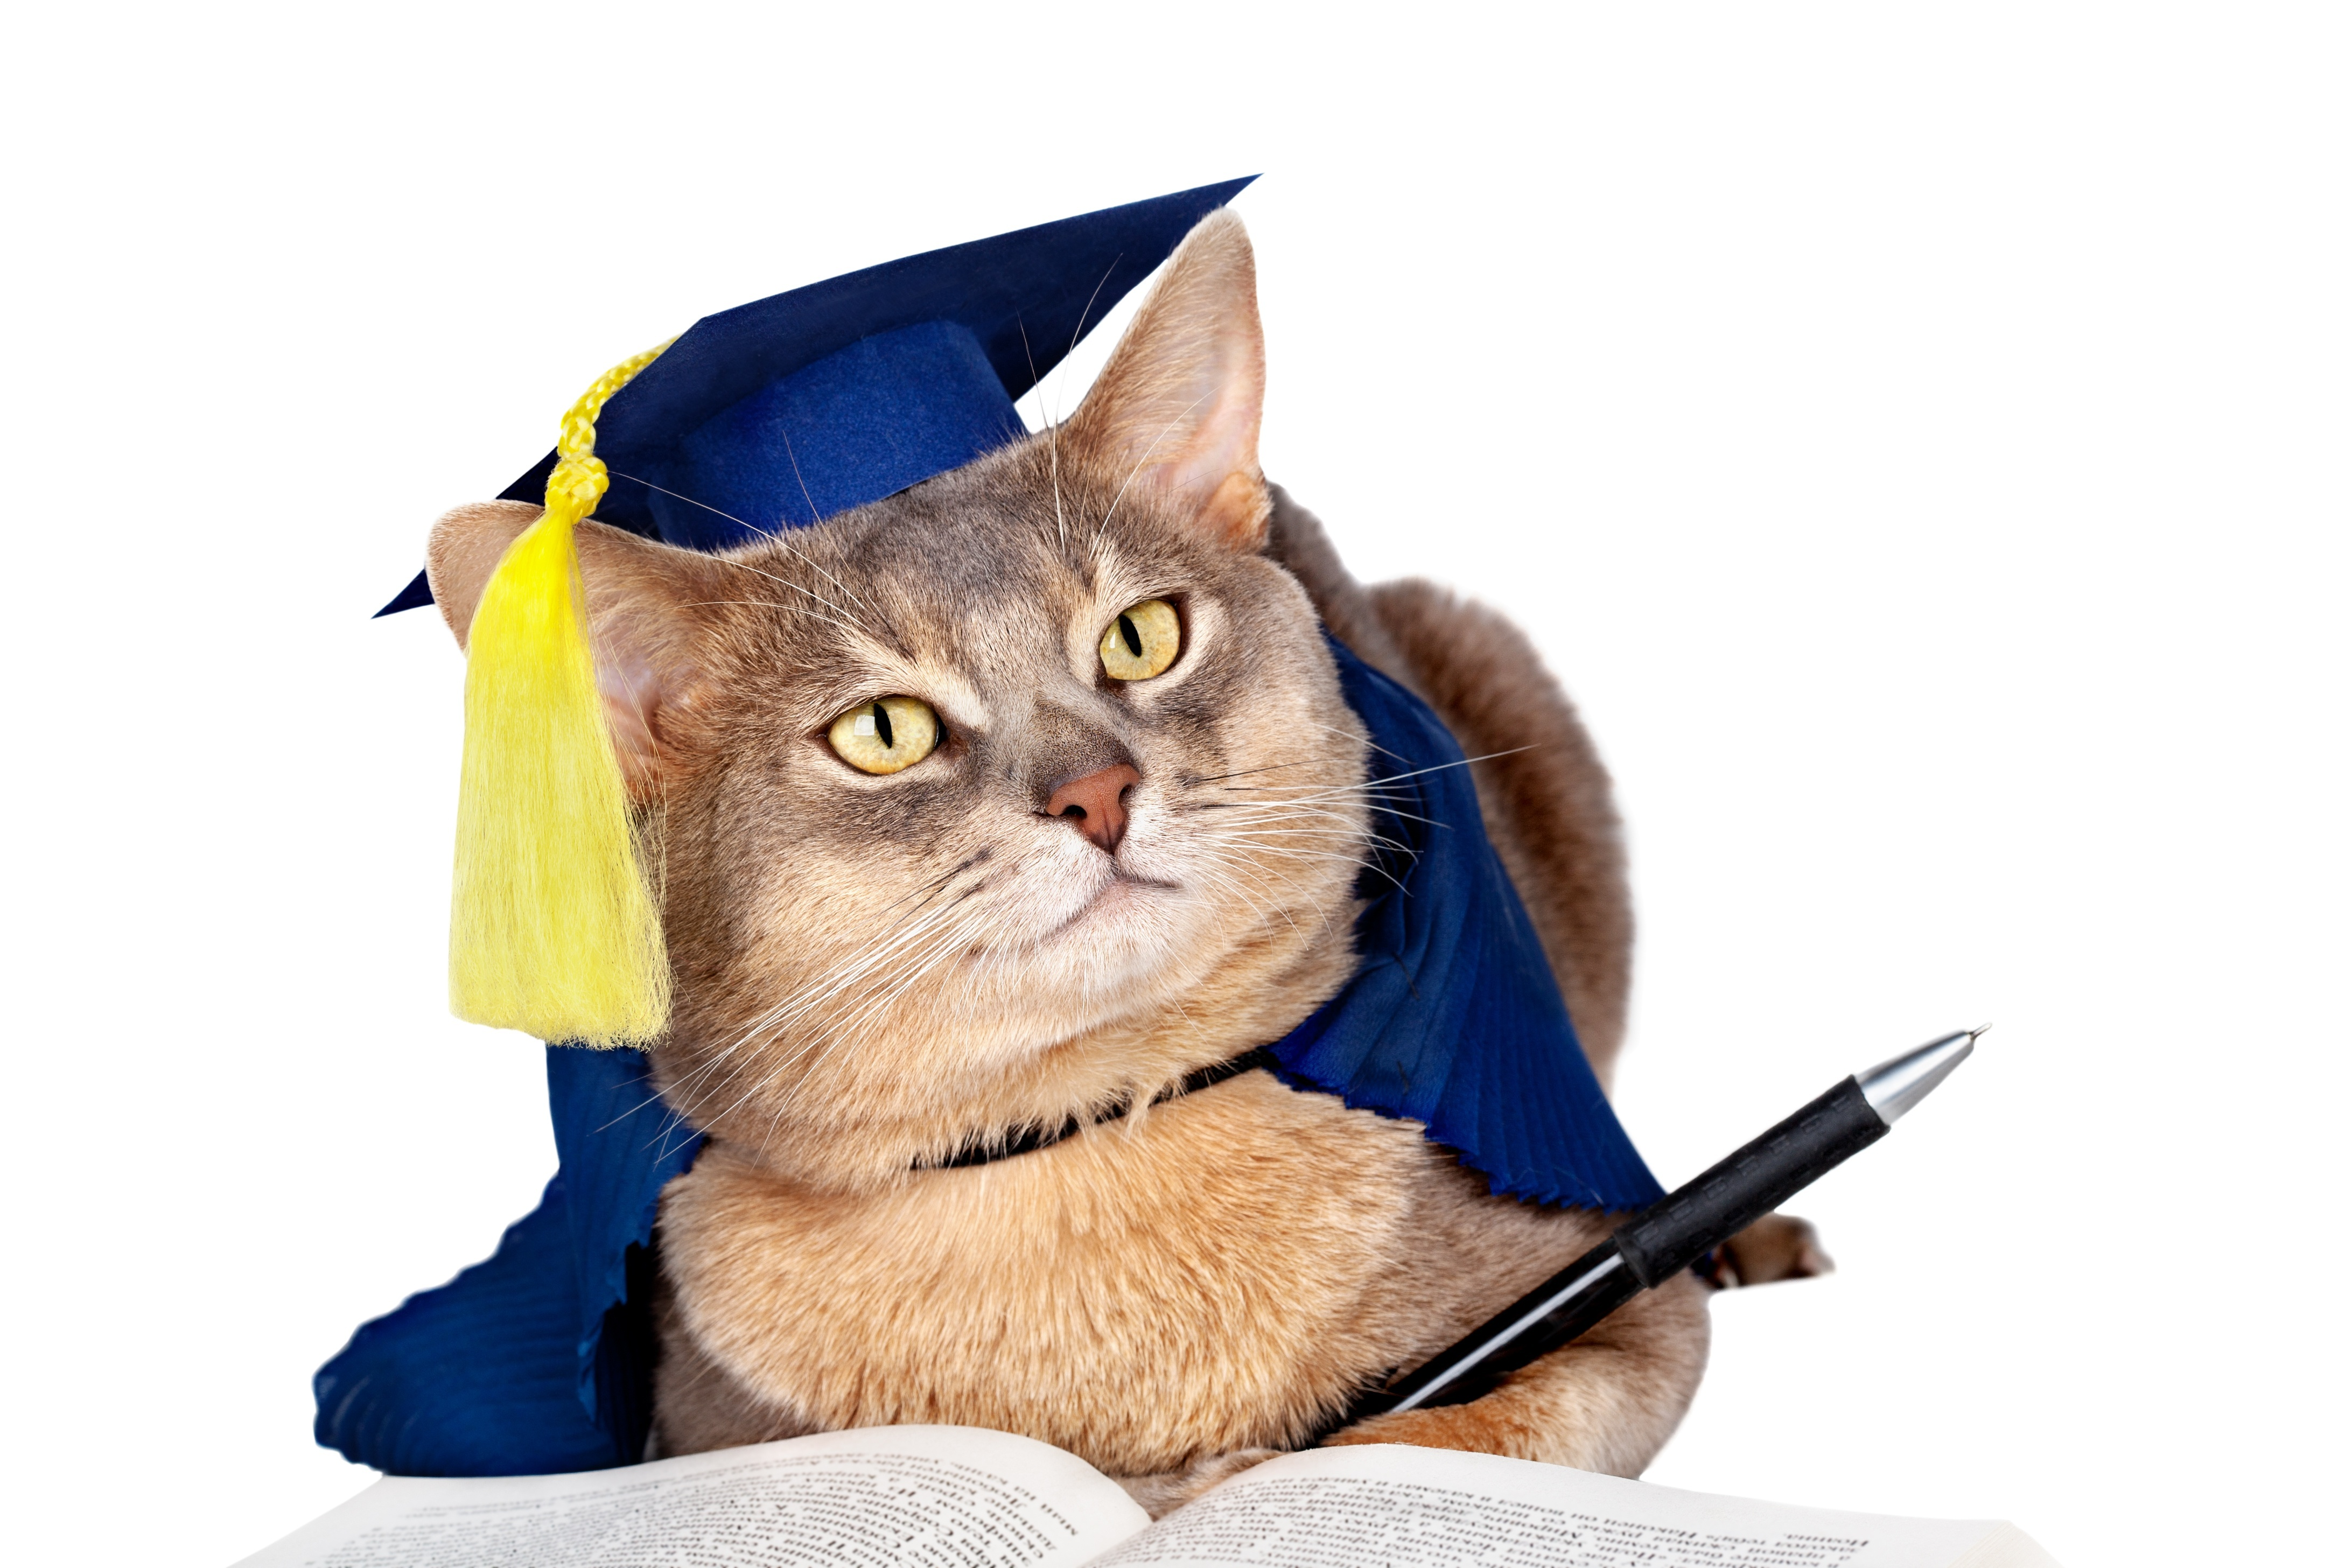 Moving to Grad School